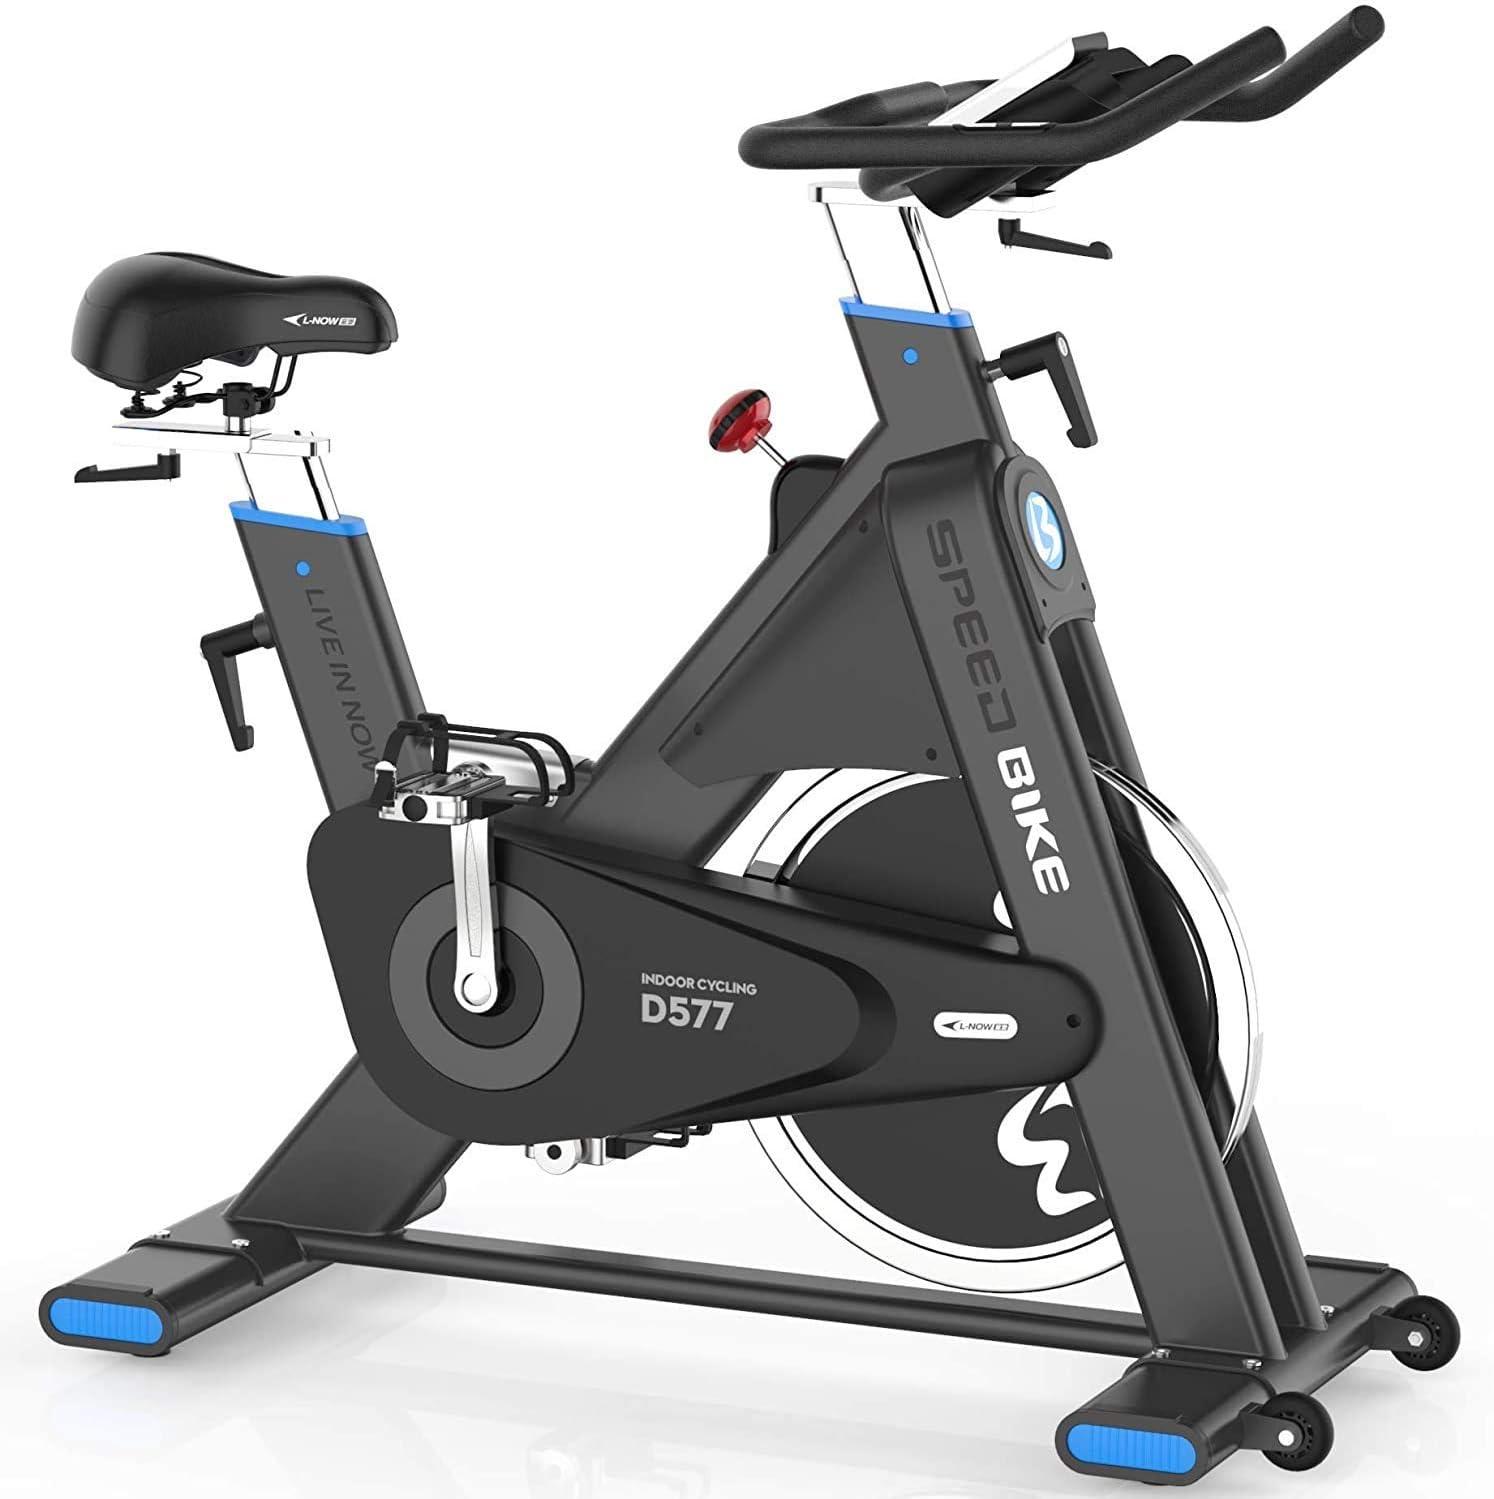 Indoor Cycling Exercise Bike 44lbs Flywheel Exercise Bike Belt D